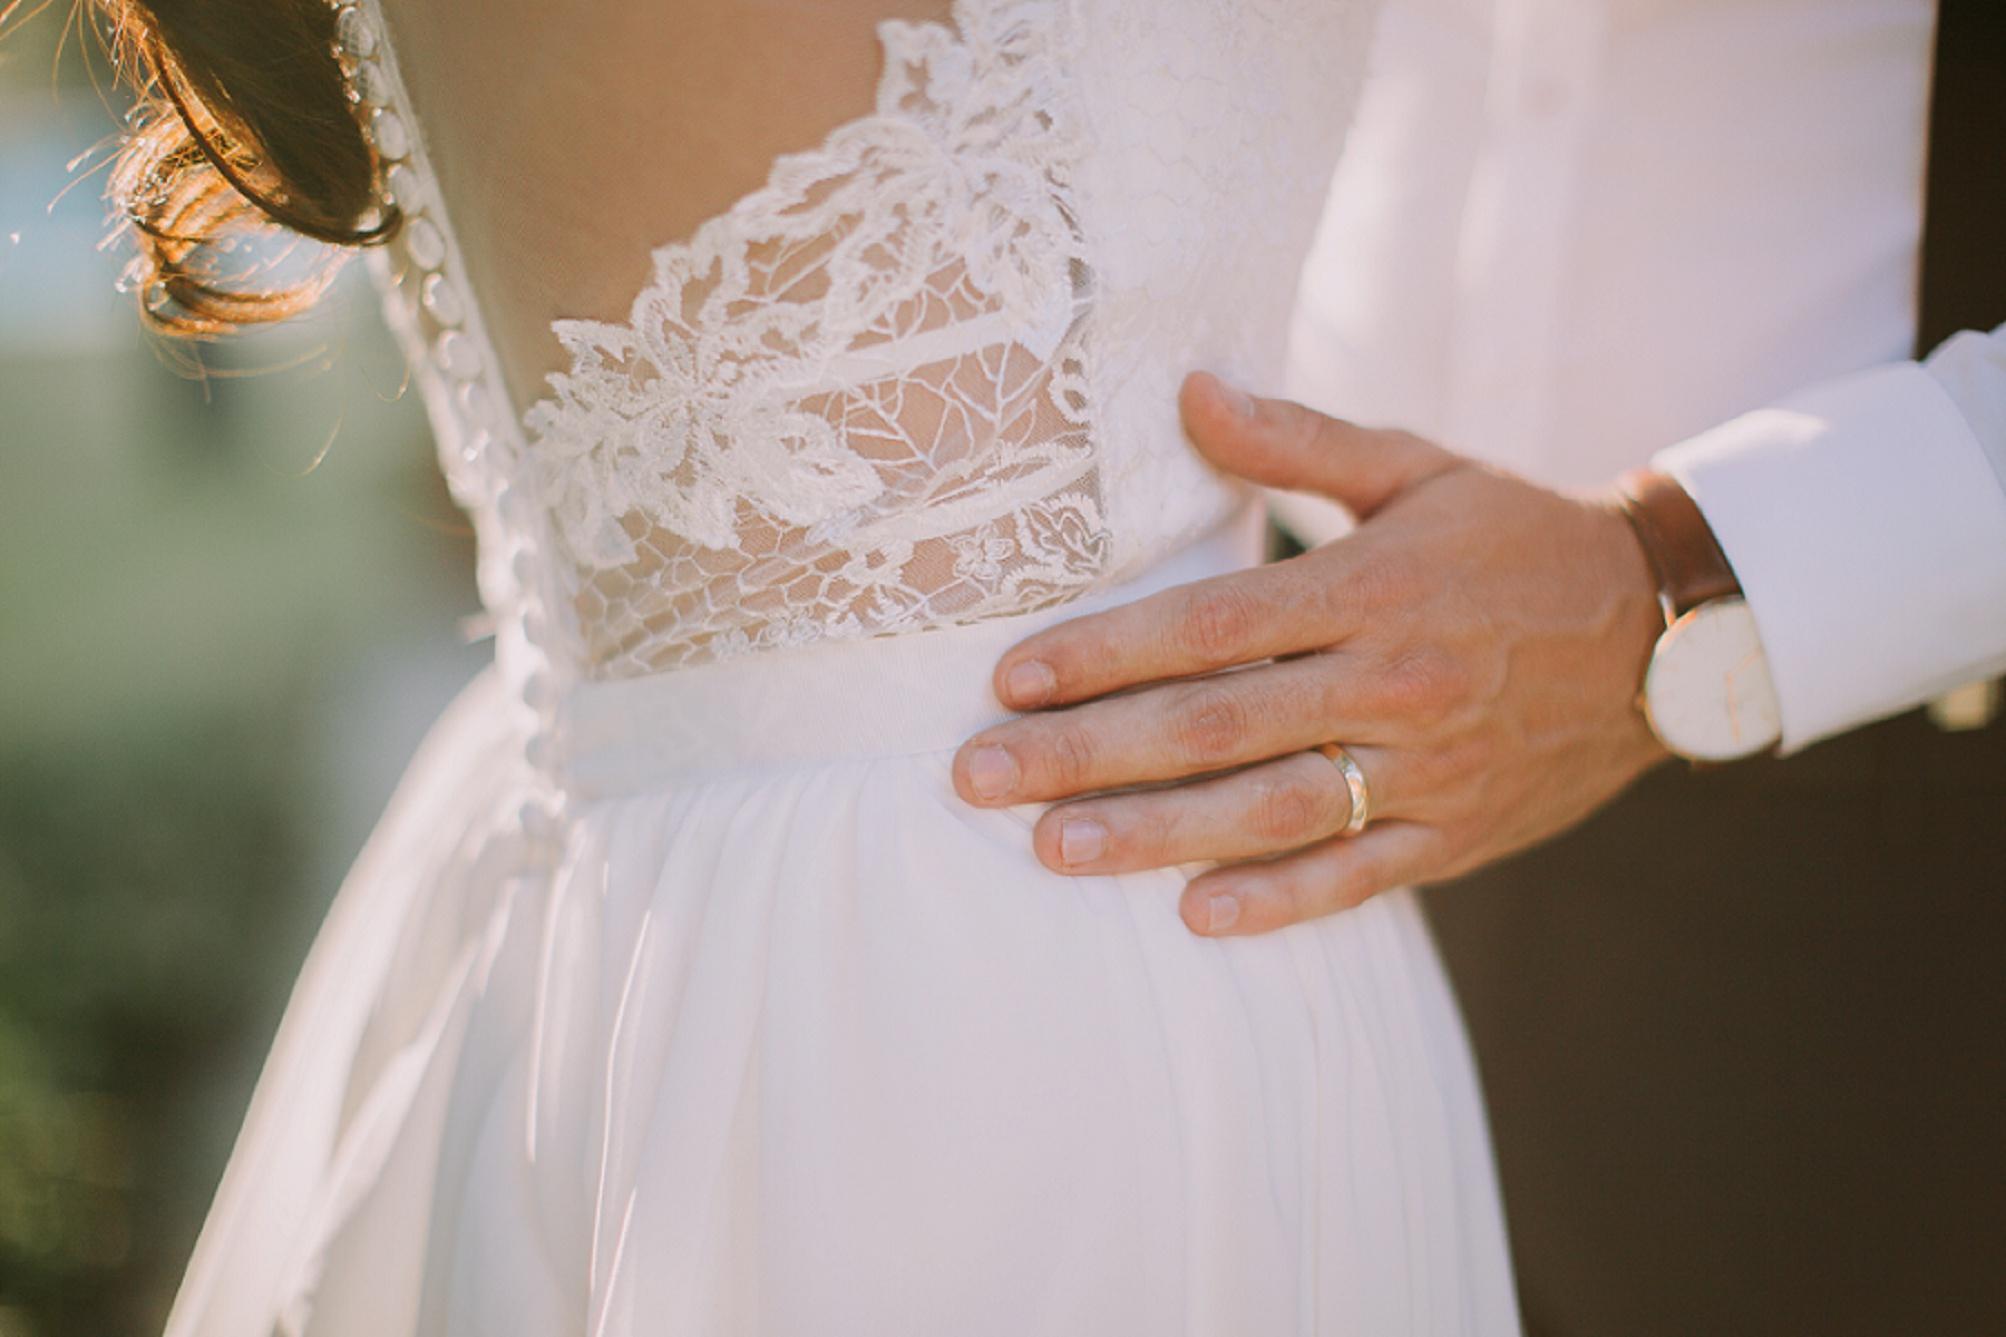 katerynaphotos-mariage-photographe-puyloubier-provence-aix-en-provence-sud-de-la-france_0429.jpg